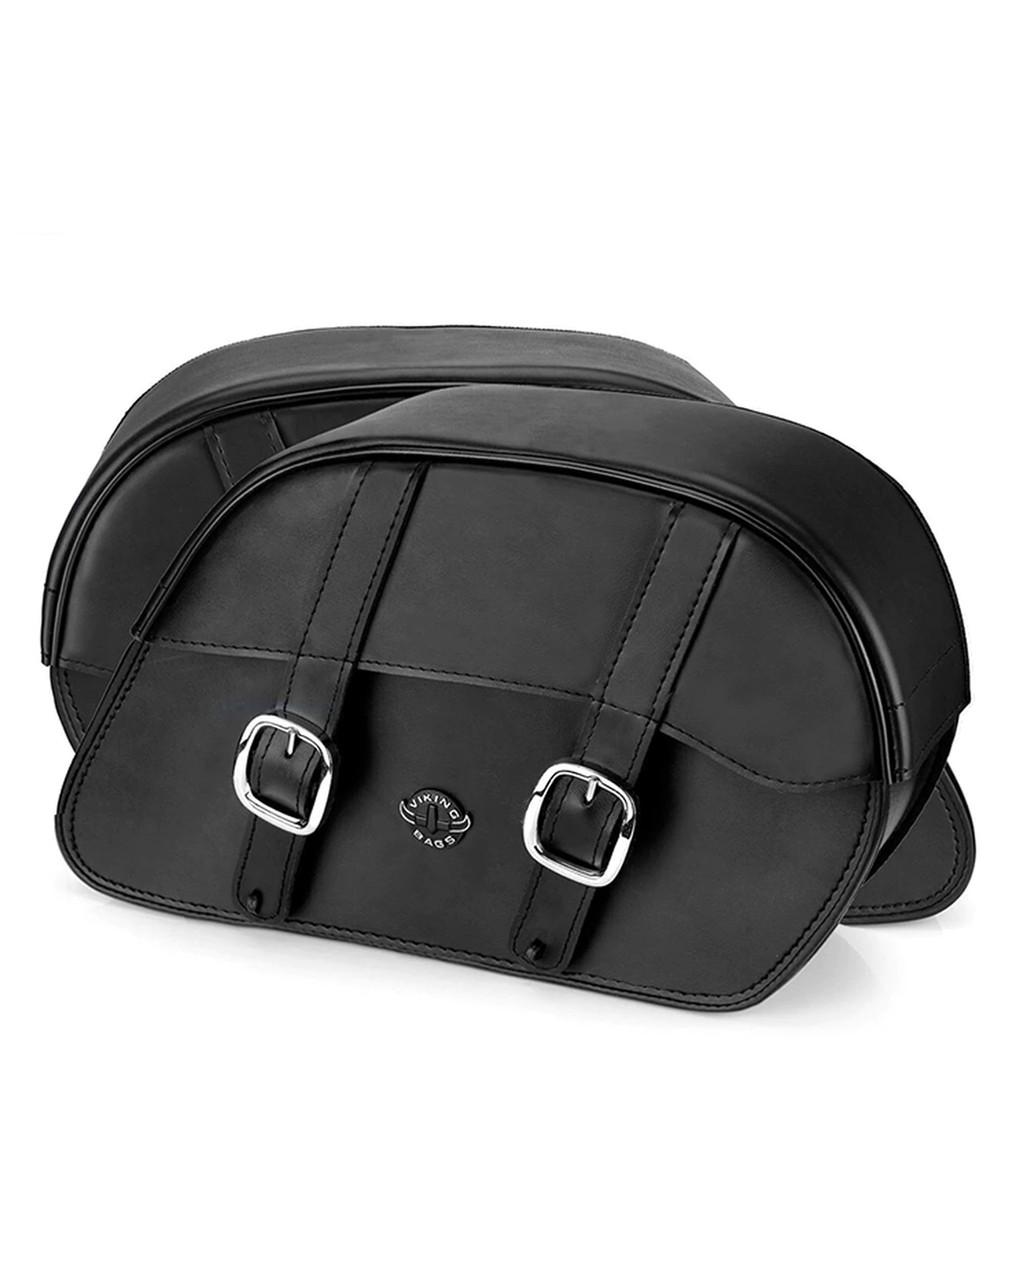 Honda 1500 Valkyrie Standard Slanted L Motorcycle saddlebags Both Bags View